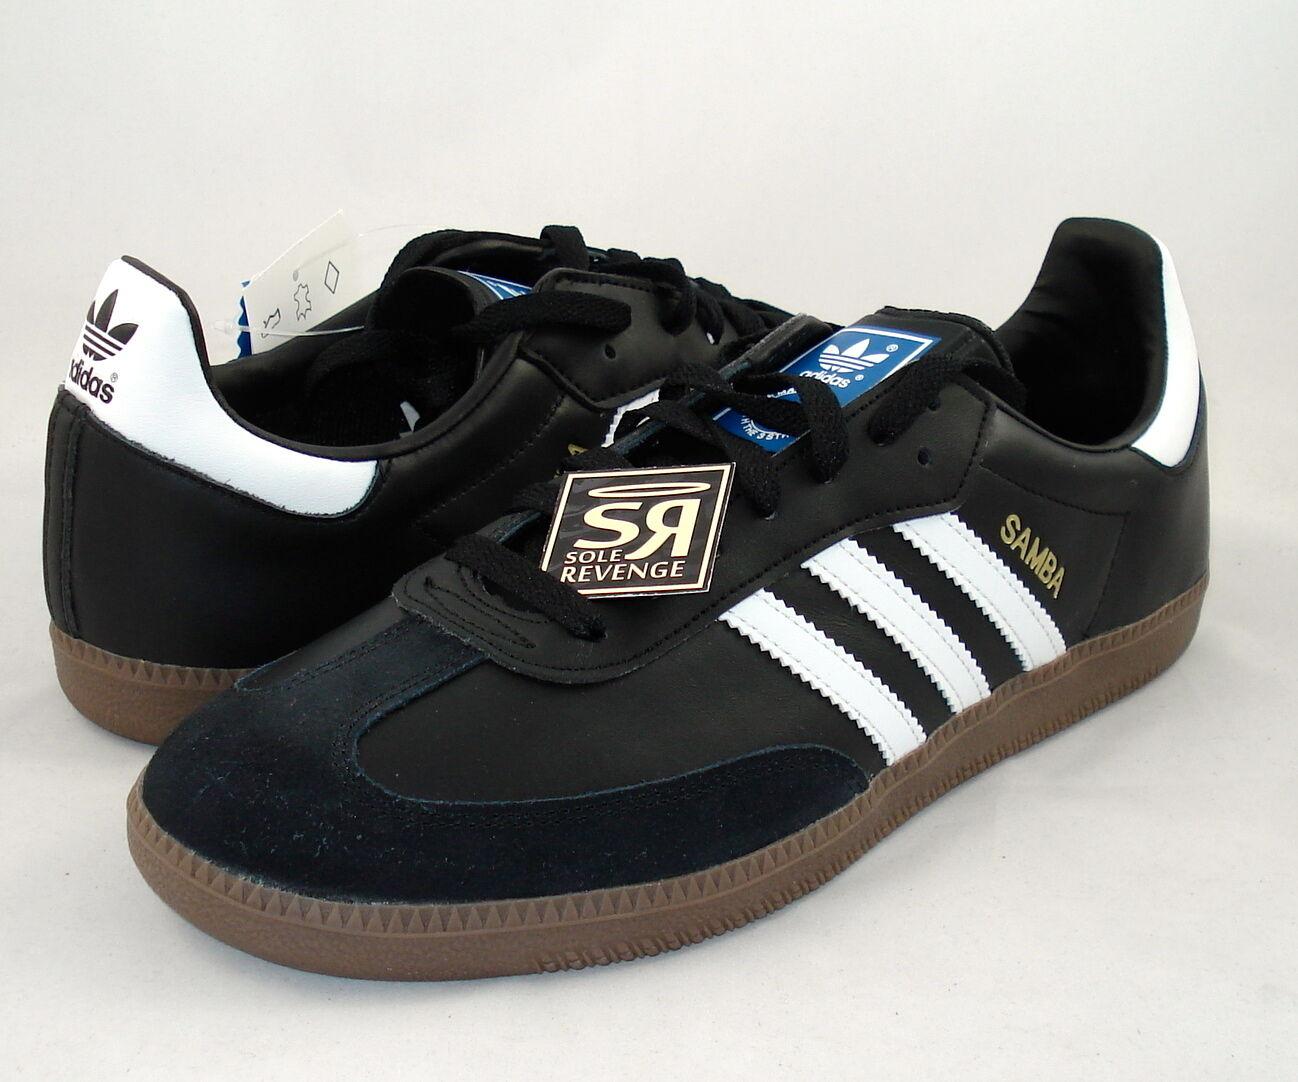 New  Adidas Originals Samba Classic shoes Black G17100 indoor soccer